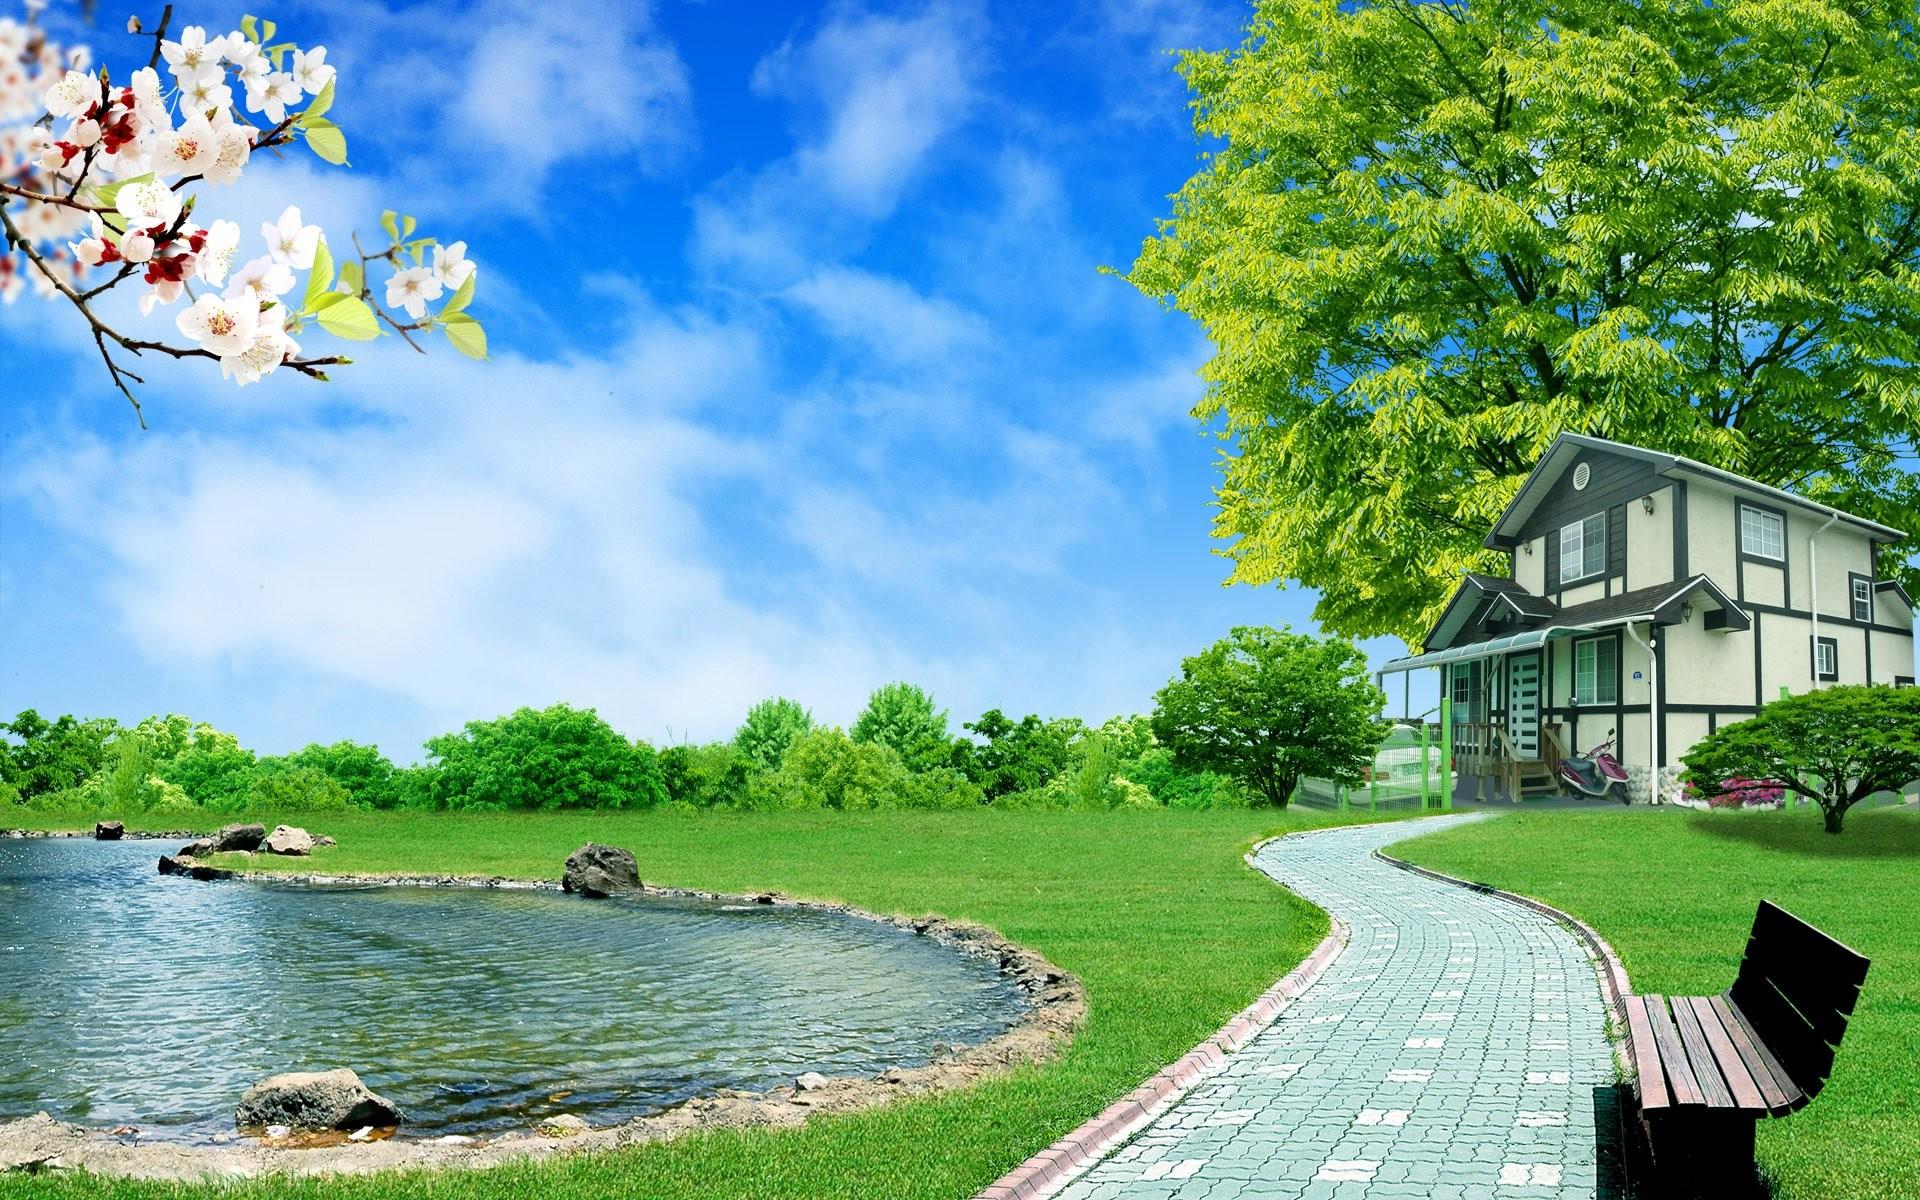 Free download 3d nature desktop high definition wallpaper 3d